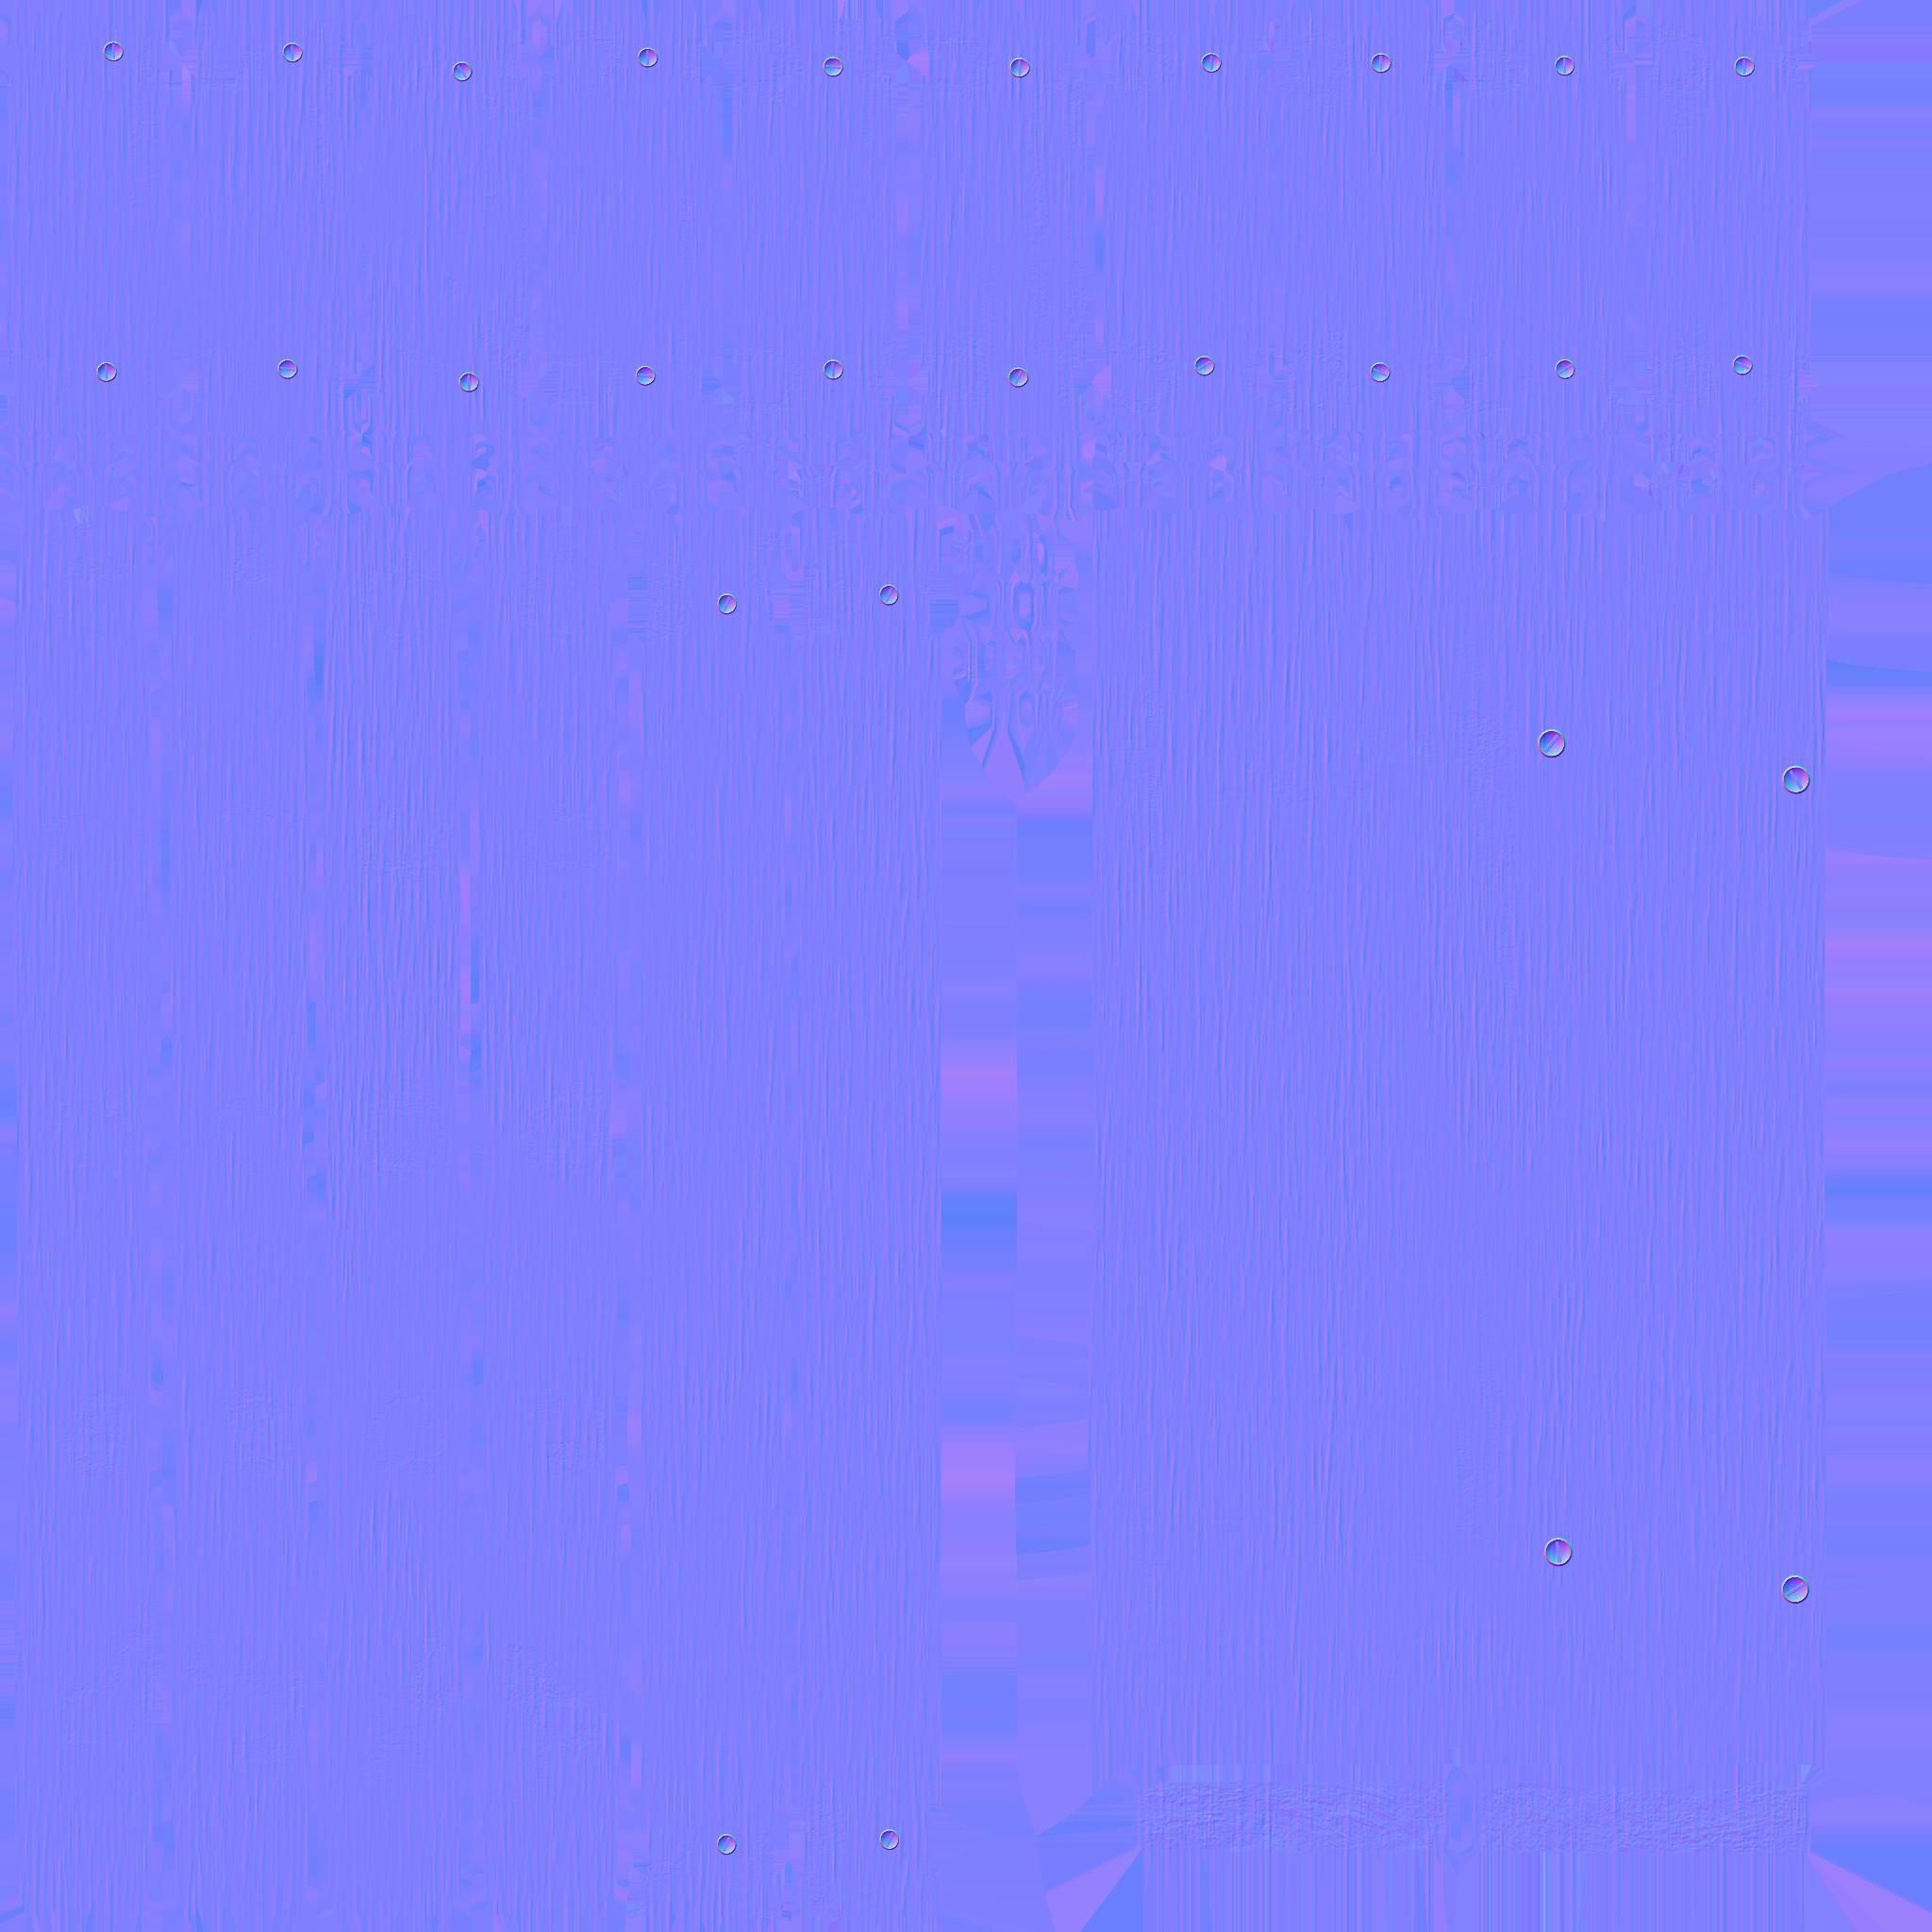 scaffoldA_uvSet_lambert5SG_Normal.png